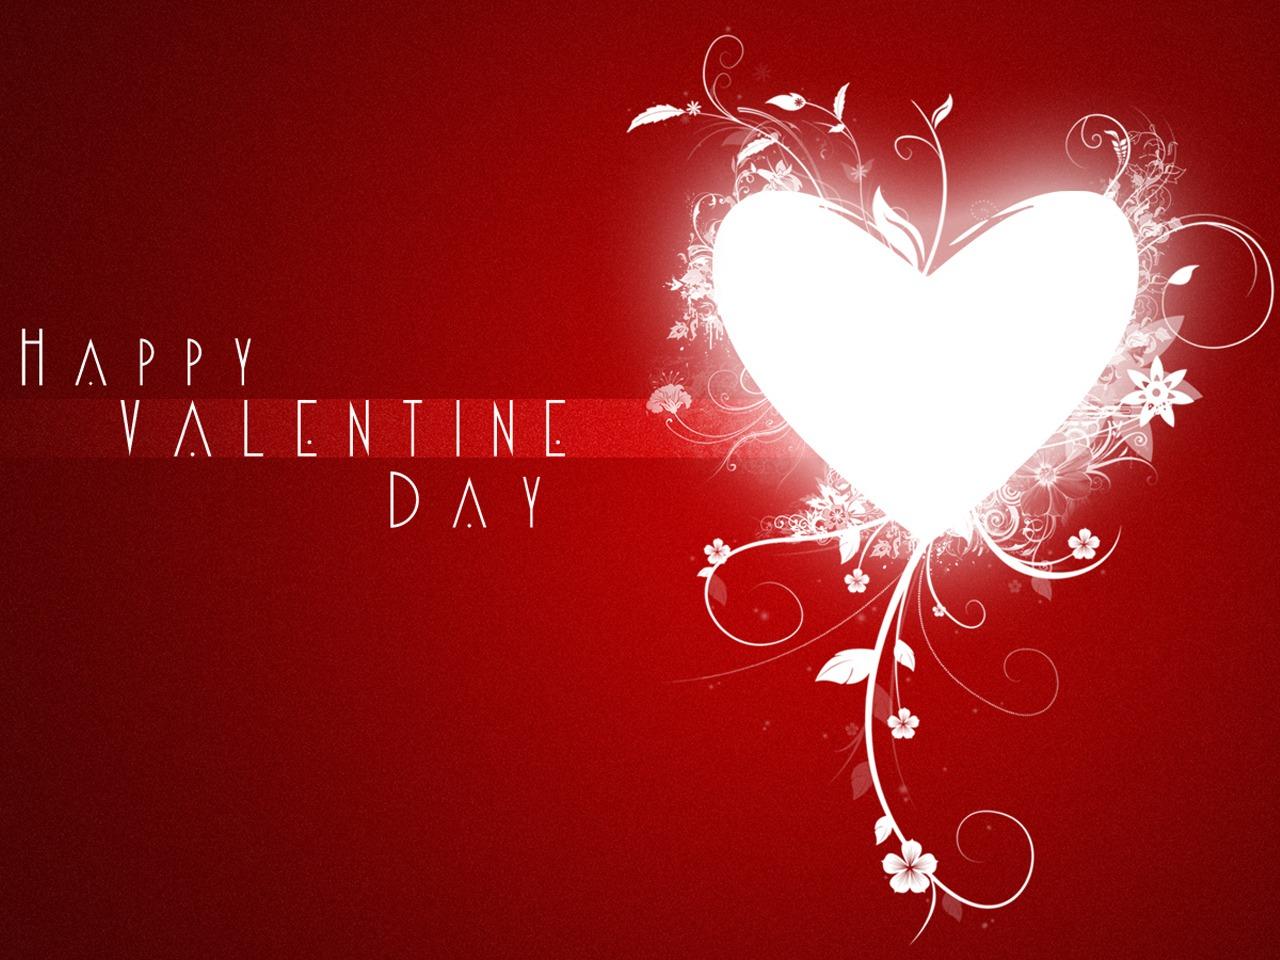 Latest Hd Happy Valentine S Day 2018 Biseworld